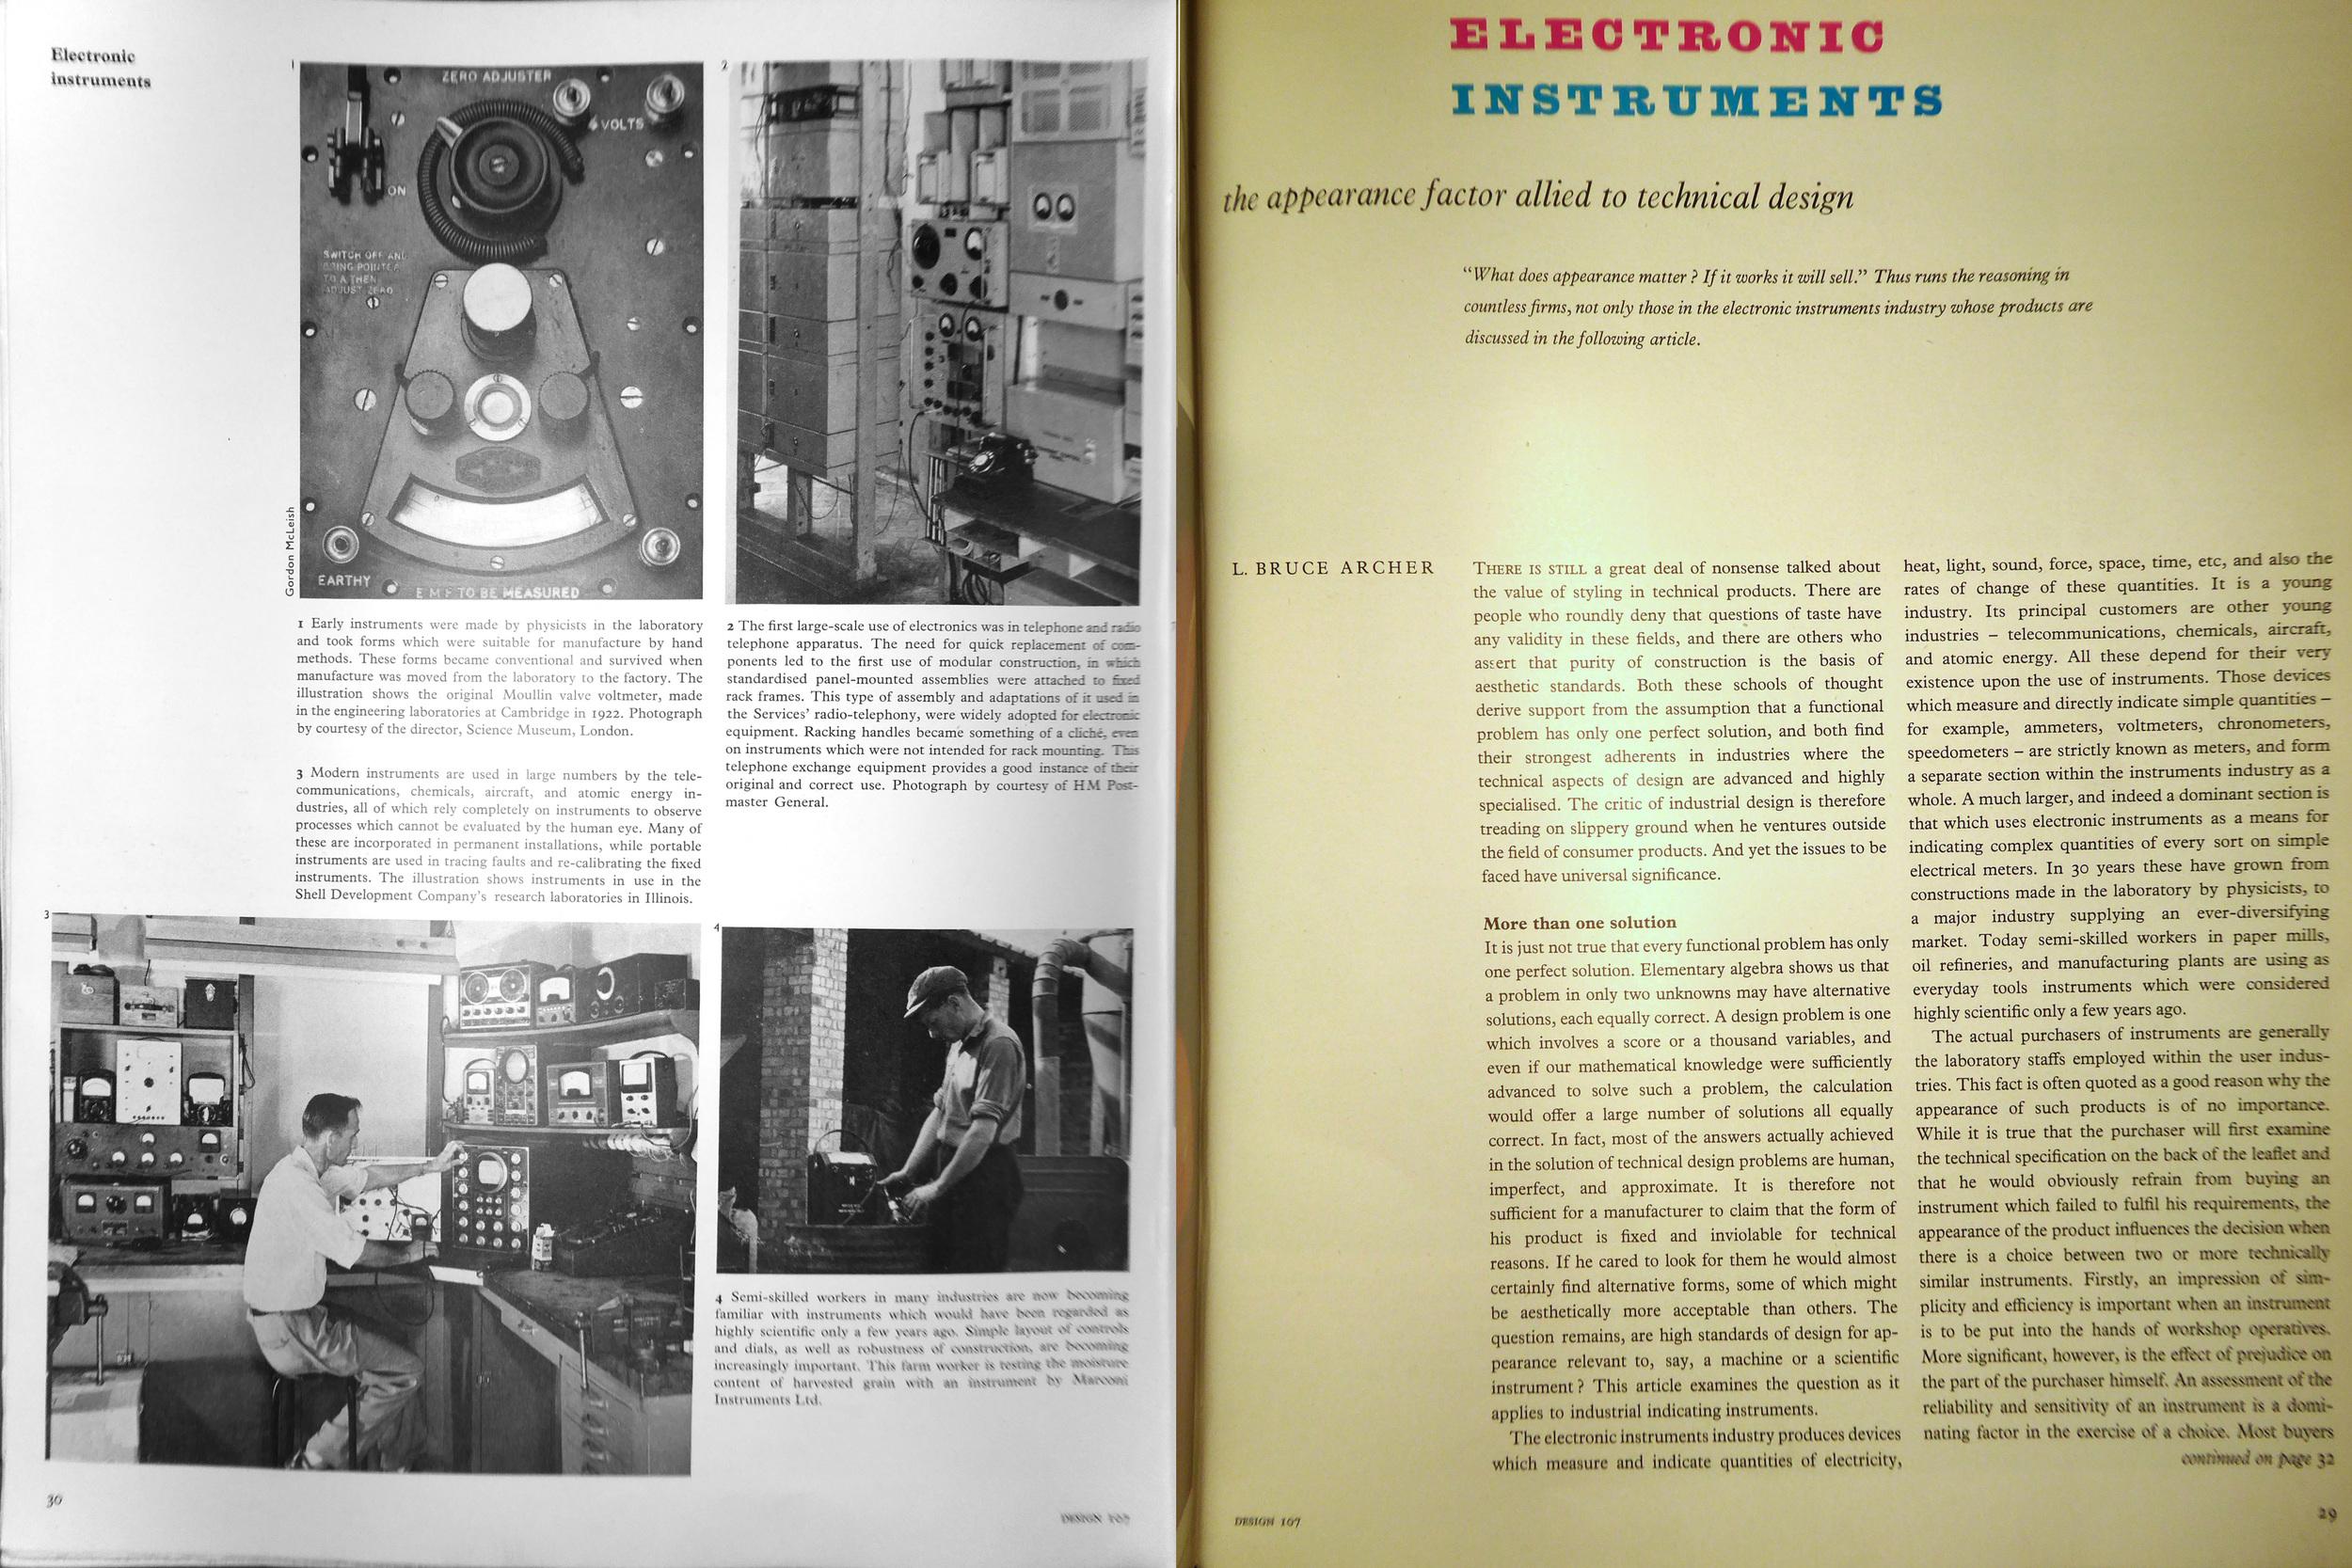 DDR_Electronic-Instruments_Nov_1957.jpg